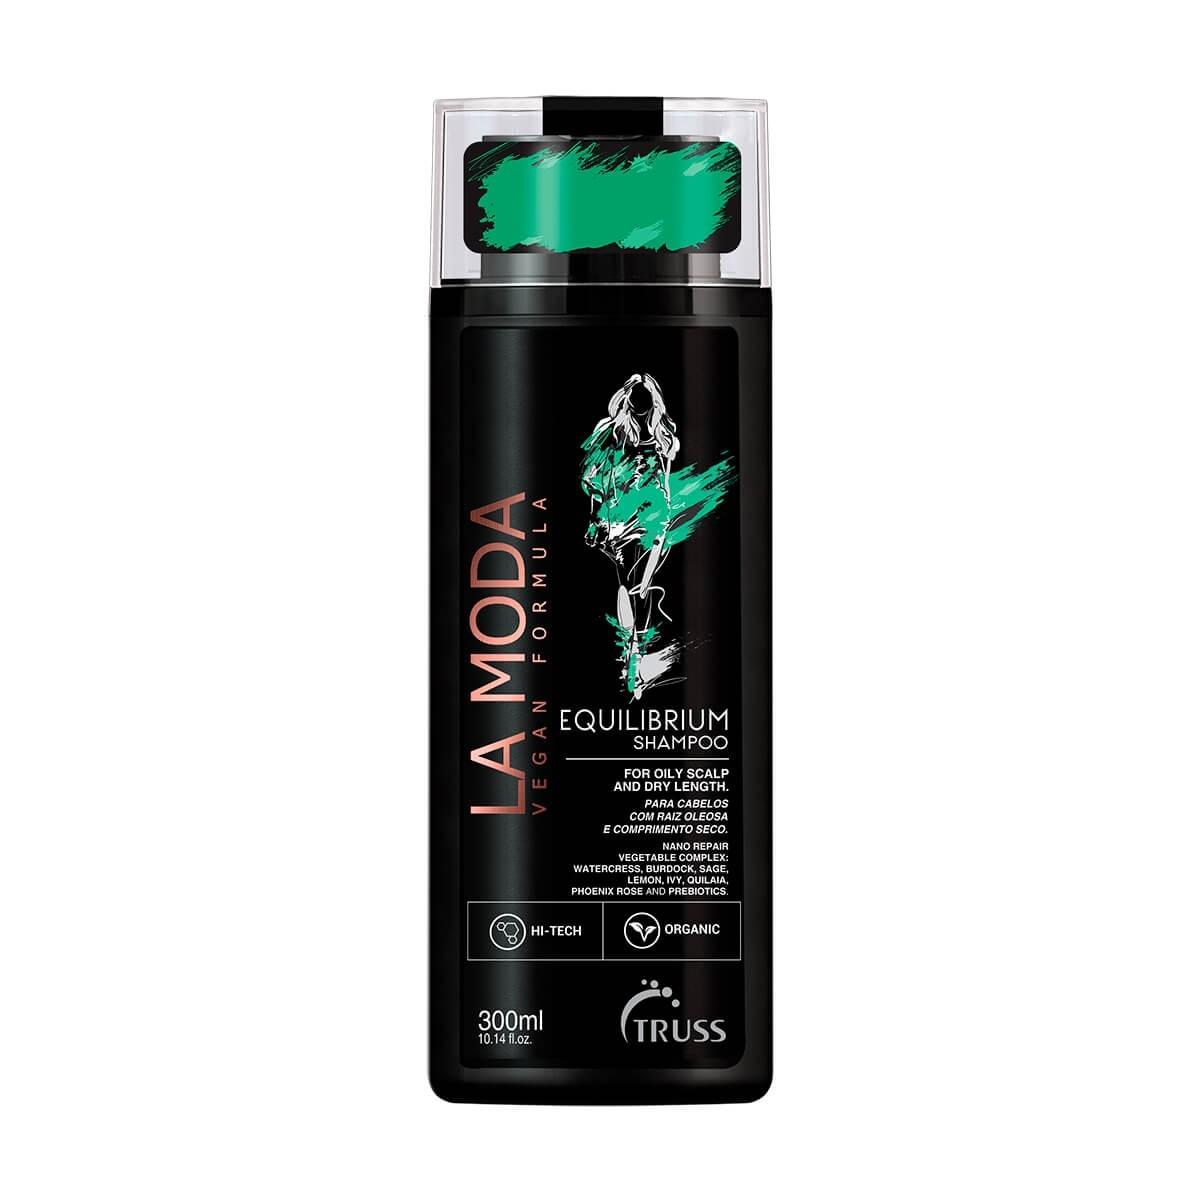 Shampoo Equilibrium LA MODA Truss 300ml